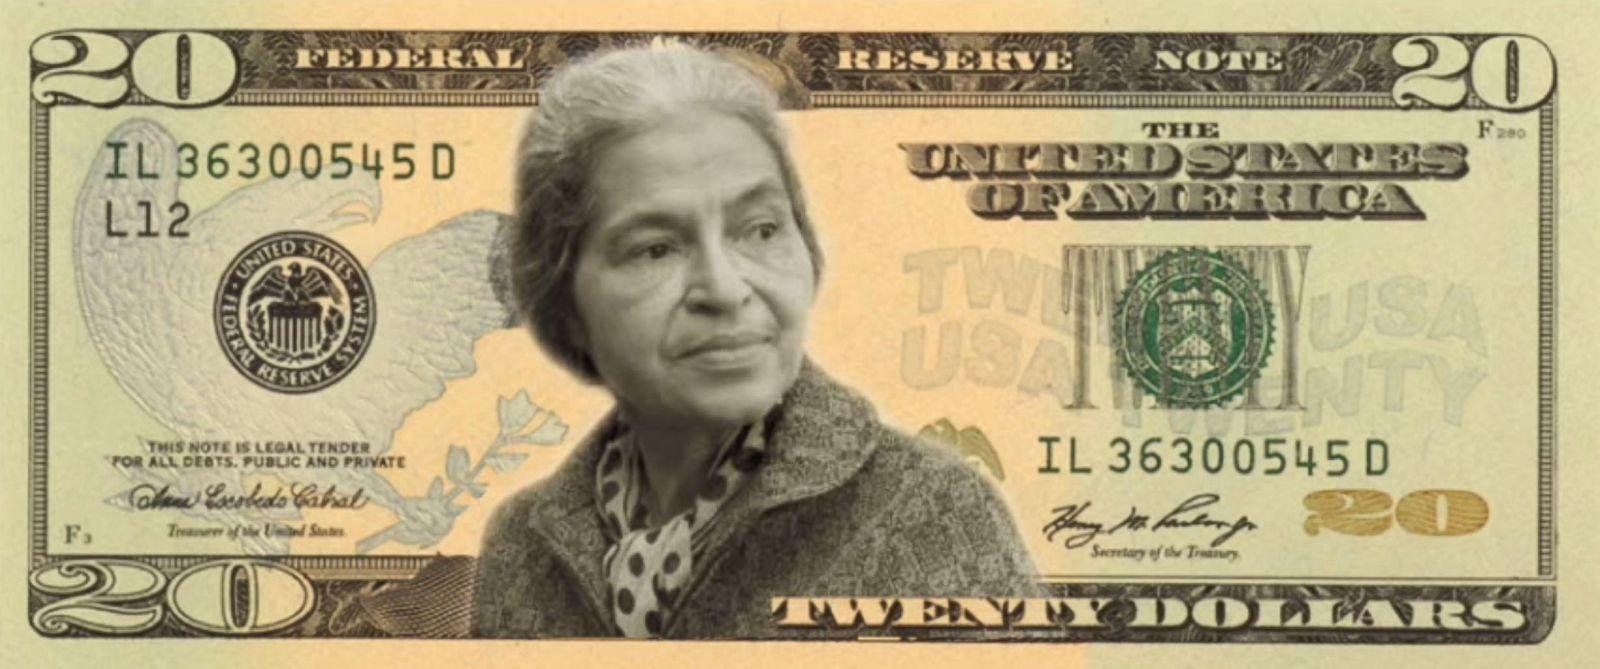 Rosa Parks Twenty Dollars Picture